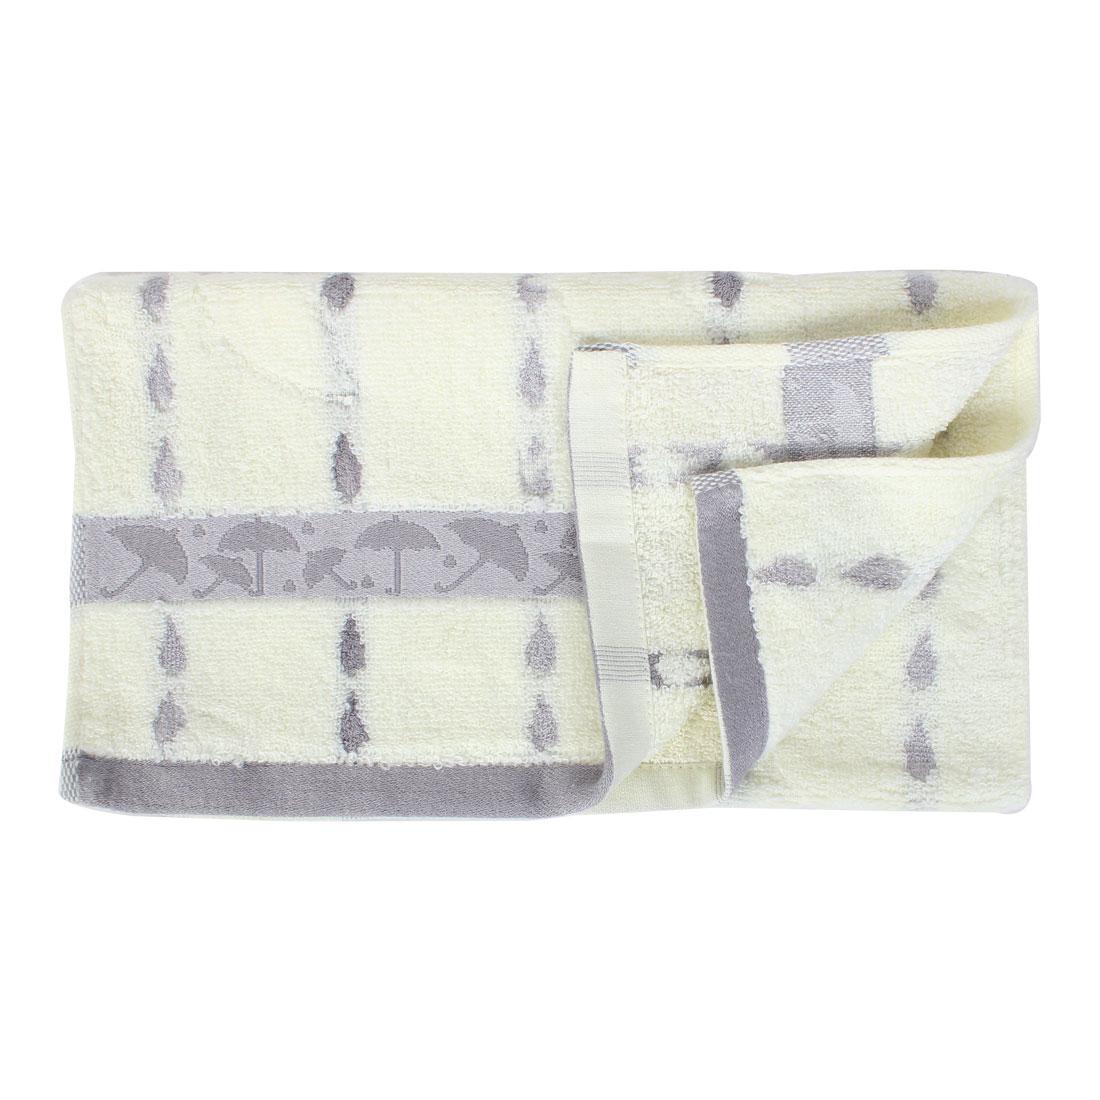 Terrycloth Drop Shape Drying Shower Bath Towel 72cm x 33cm Gray